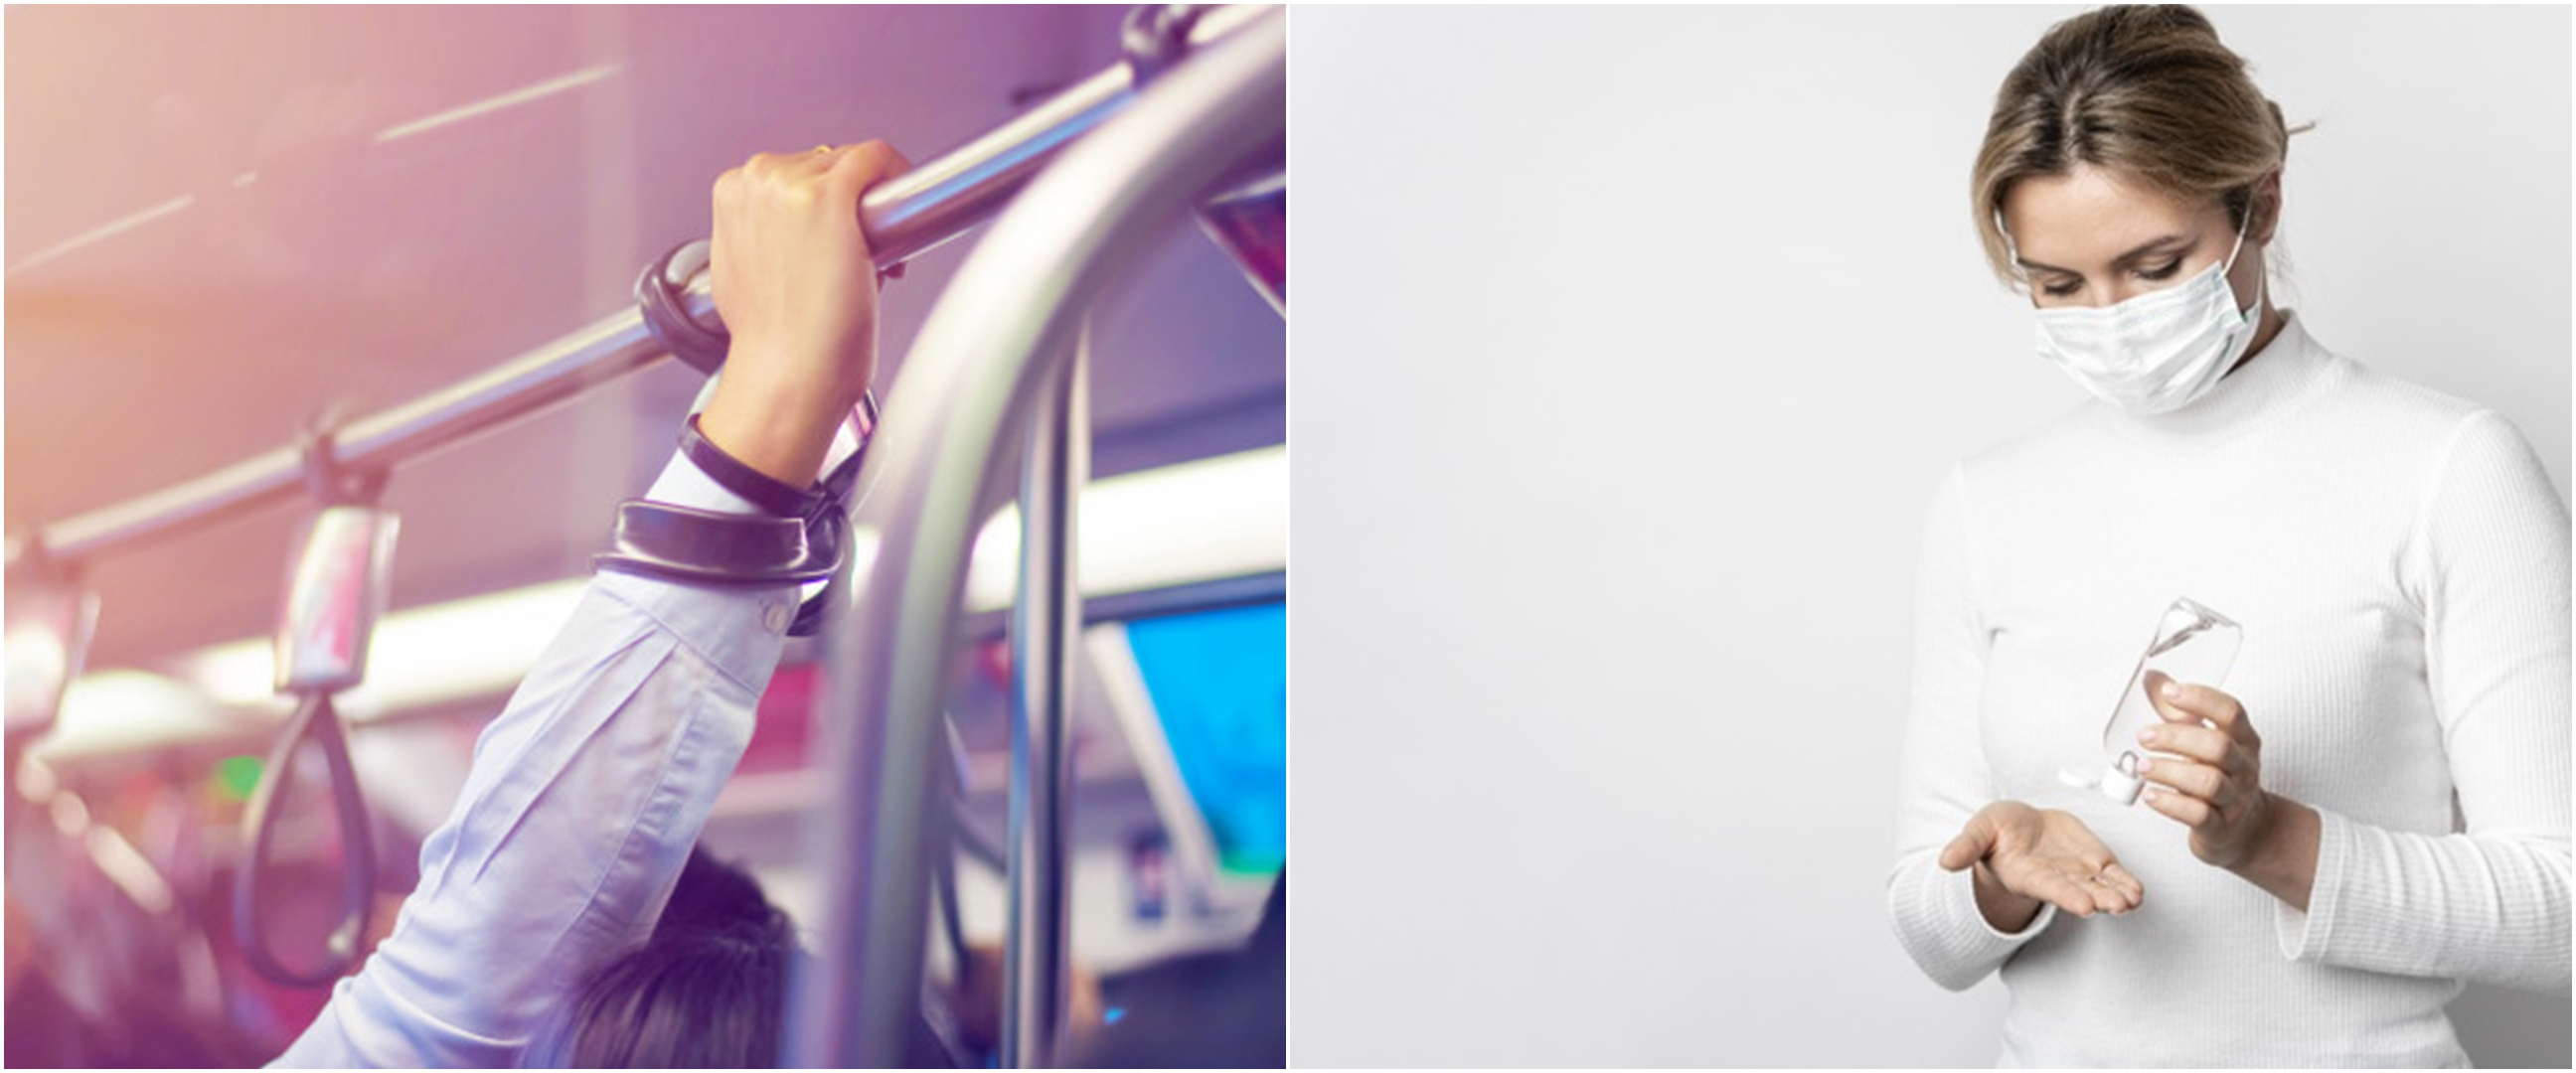 5 Tips aman naik kendaraan umum agar terhindar virus Corona